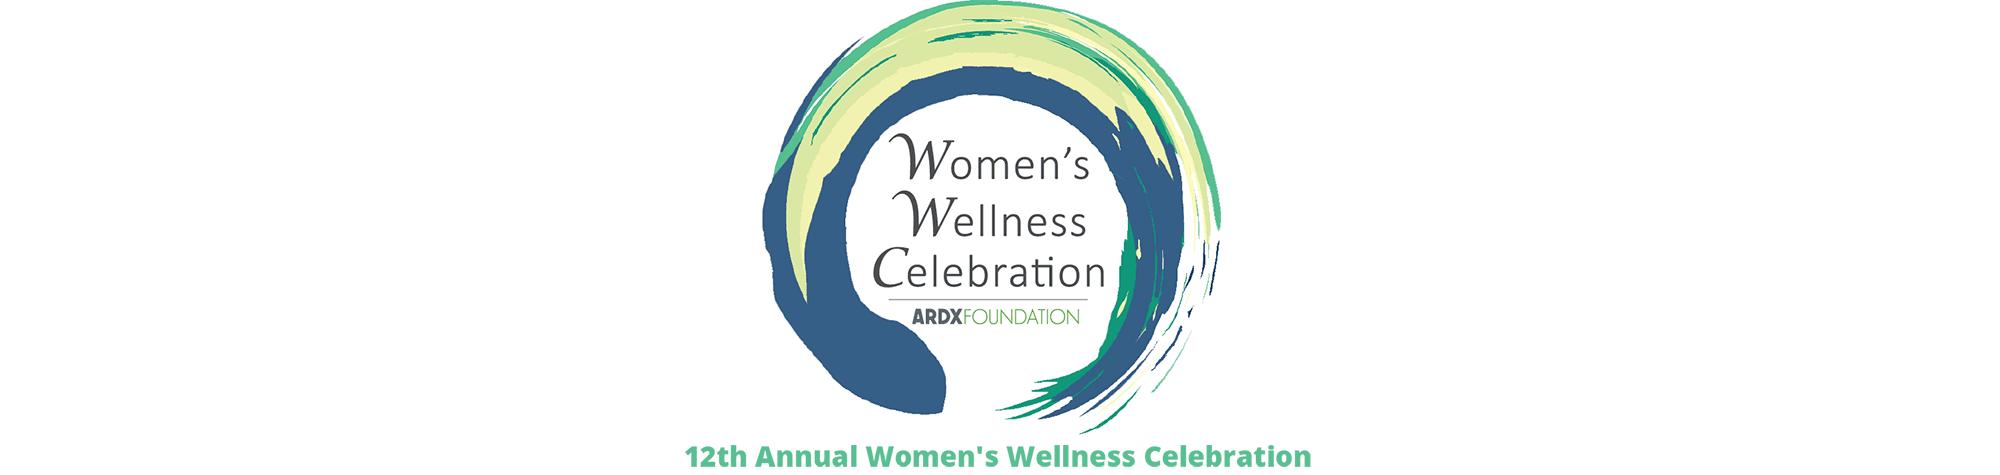 12th Annual Women's Wellness Celebration